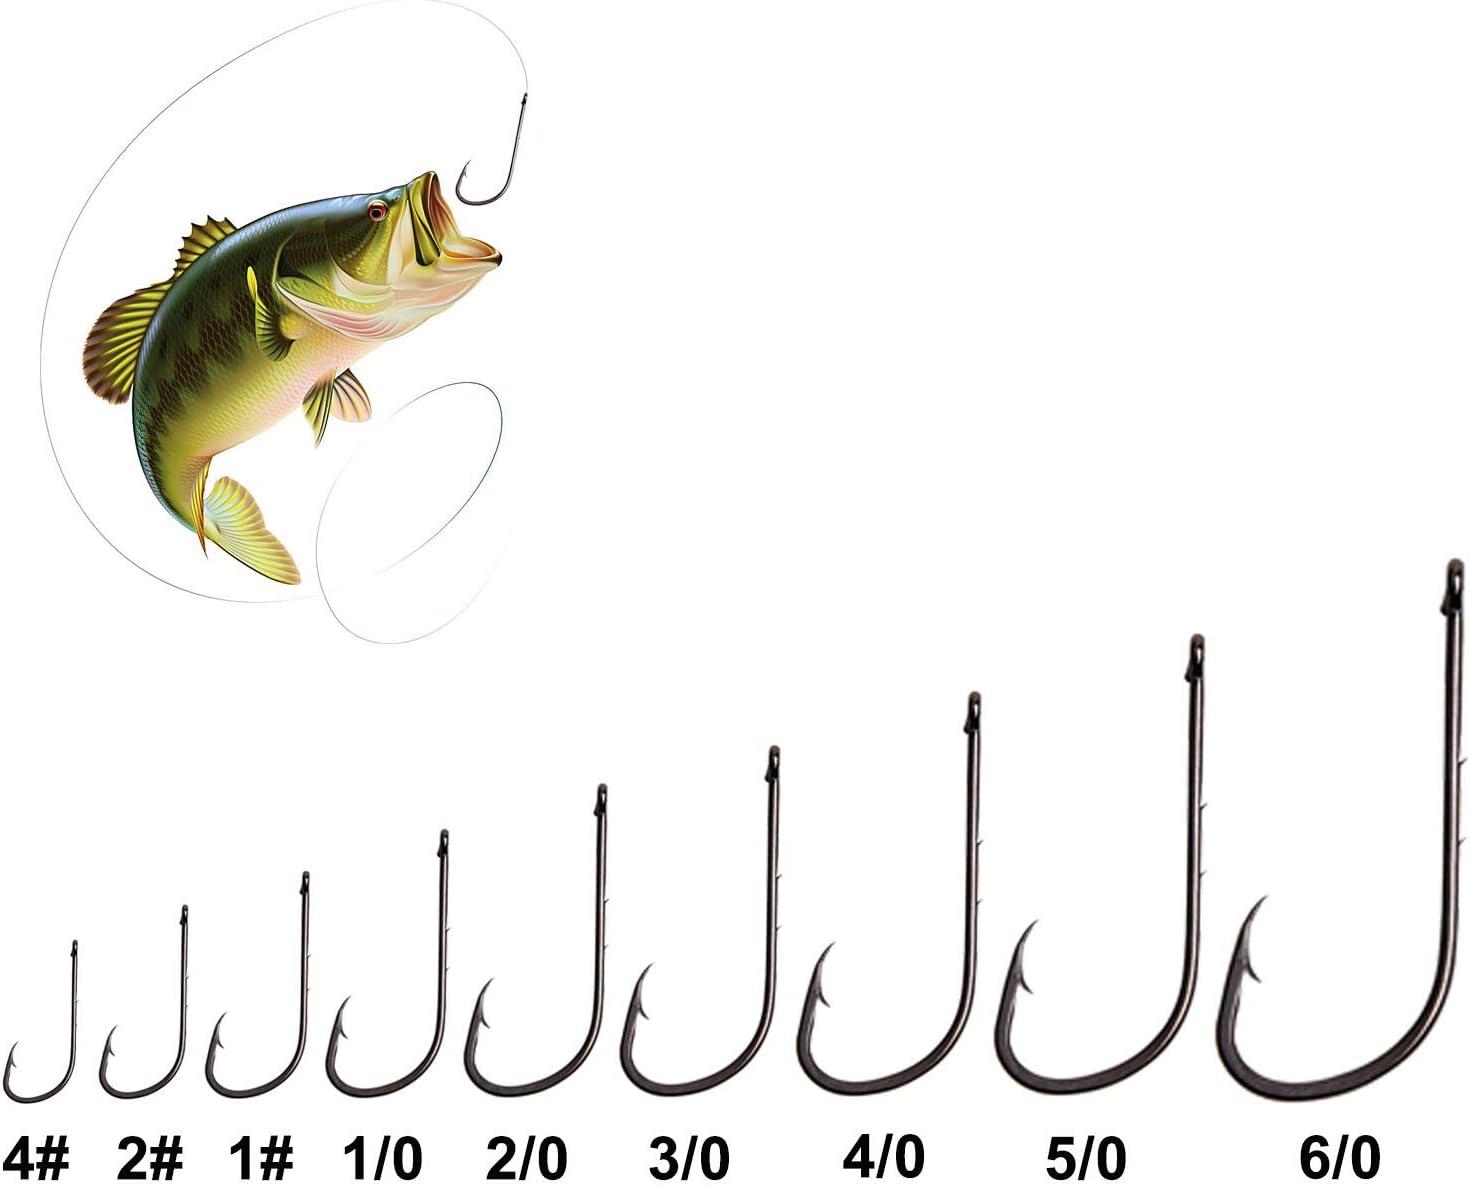 Baitholder Hooks Strong Sharp Barbed Eyed Pike Perch Lure Sea Fishing Long Shank